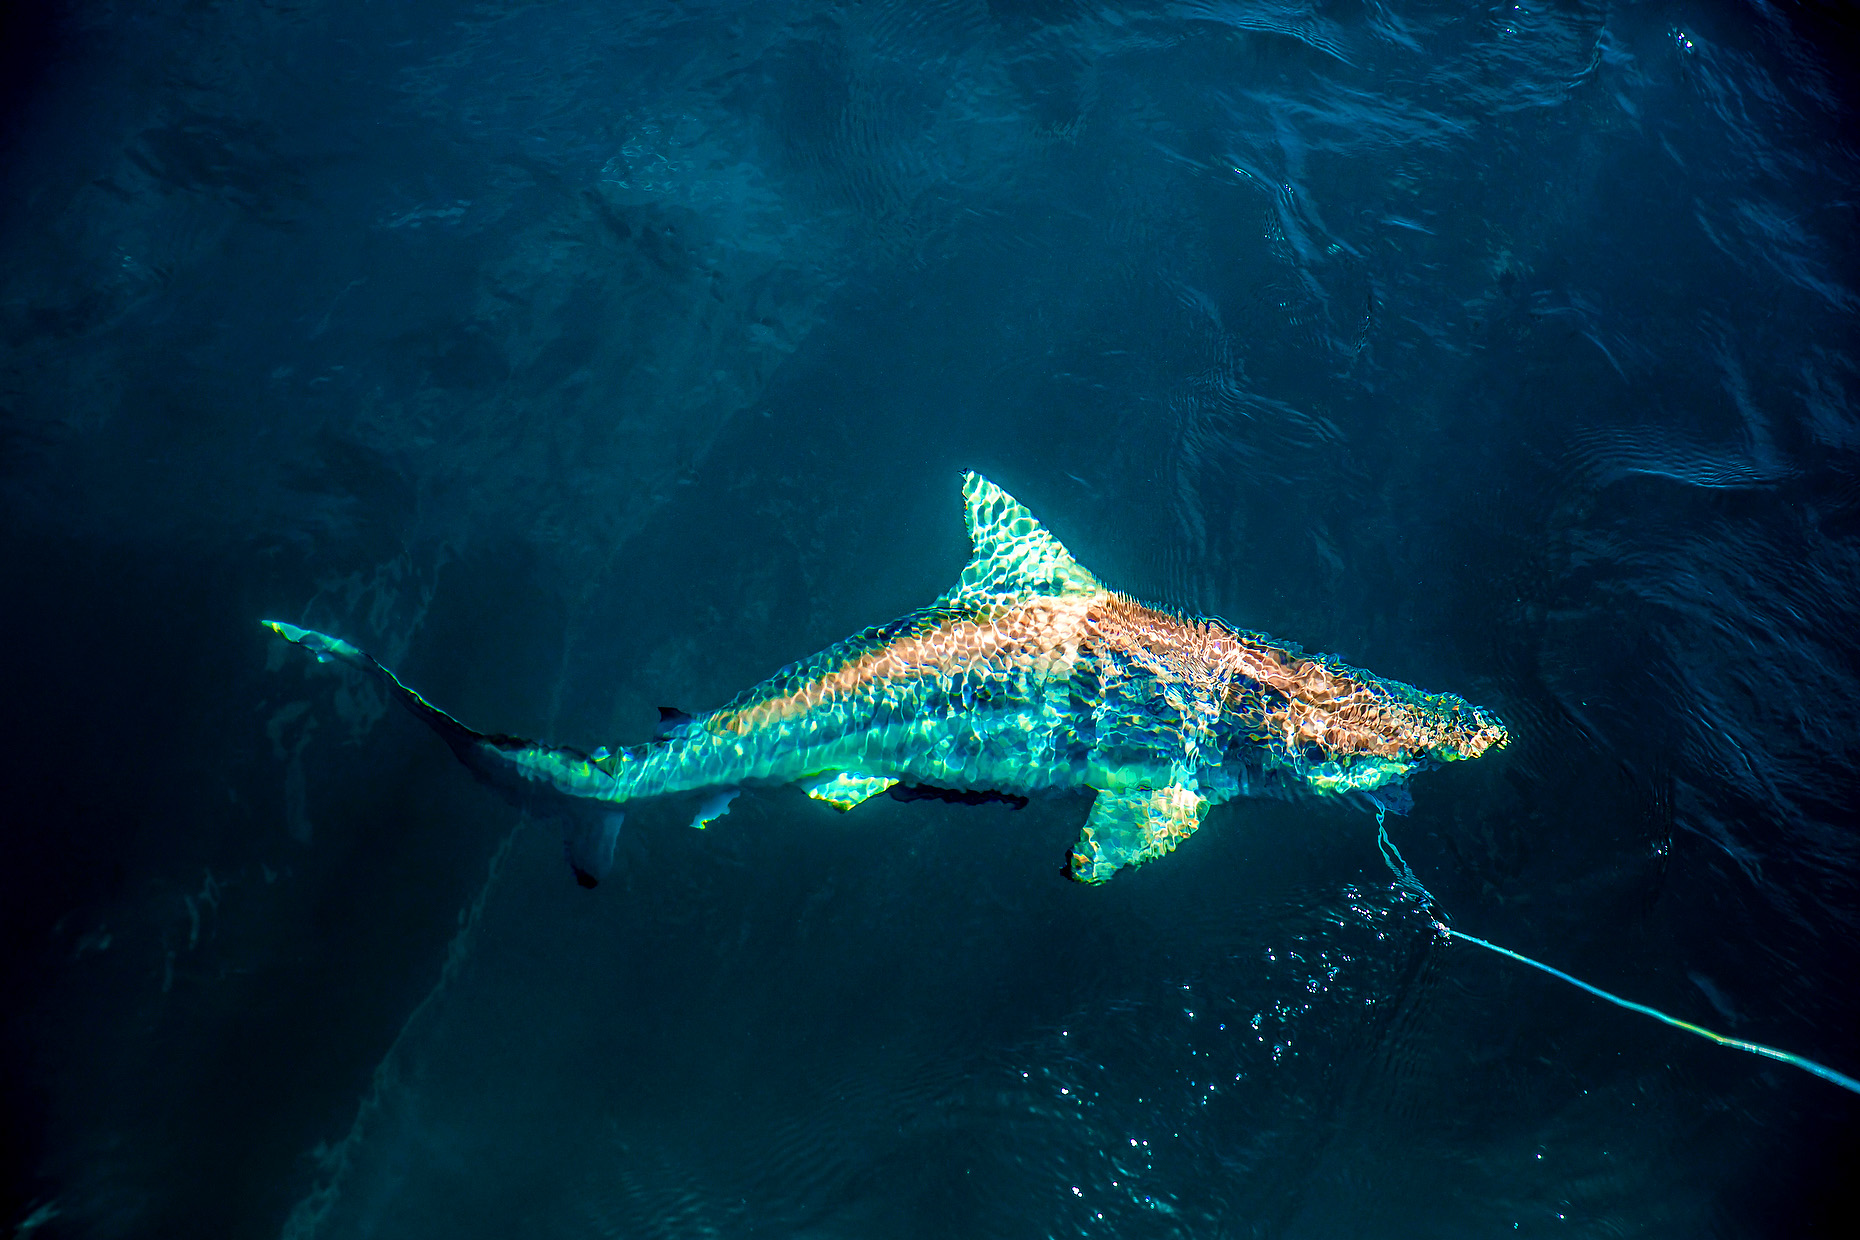 NEW COLLEGE OF FLORIDA SHARK MARINE BIOLOGY 0024.JPG